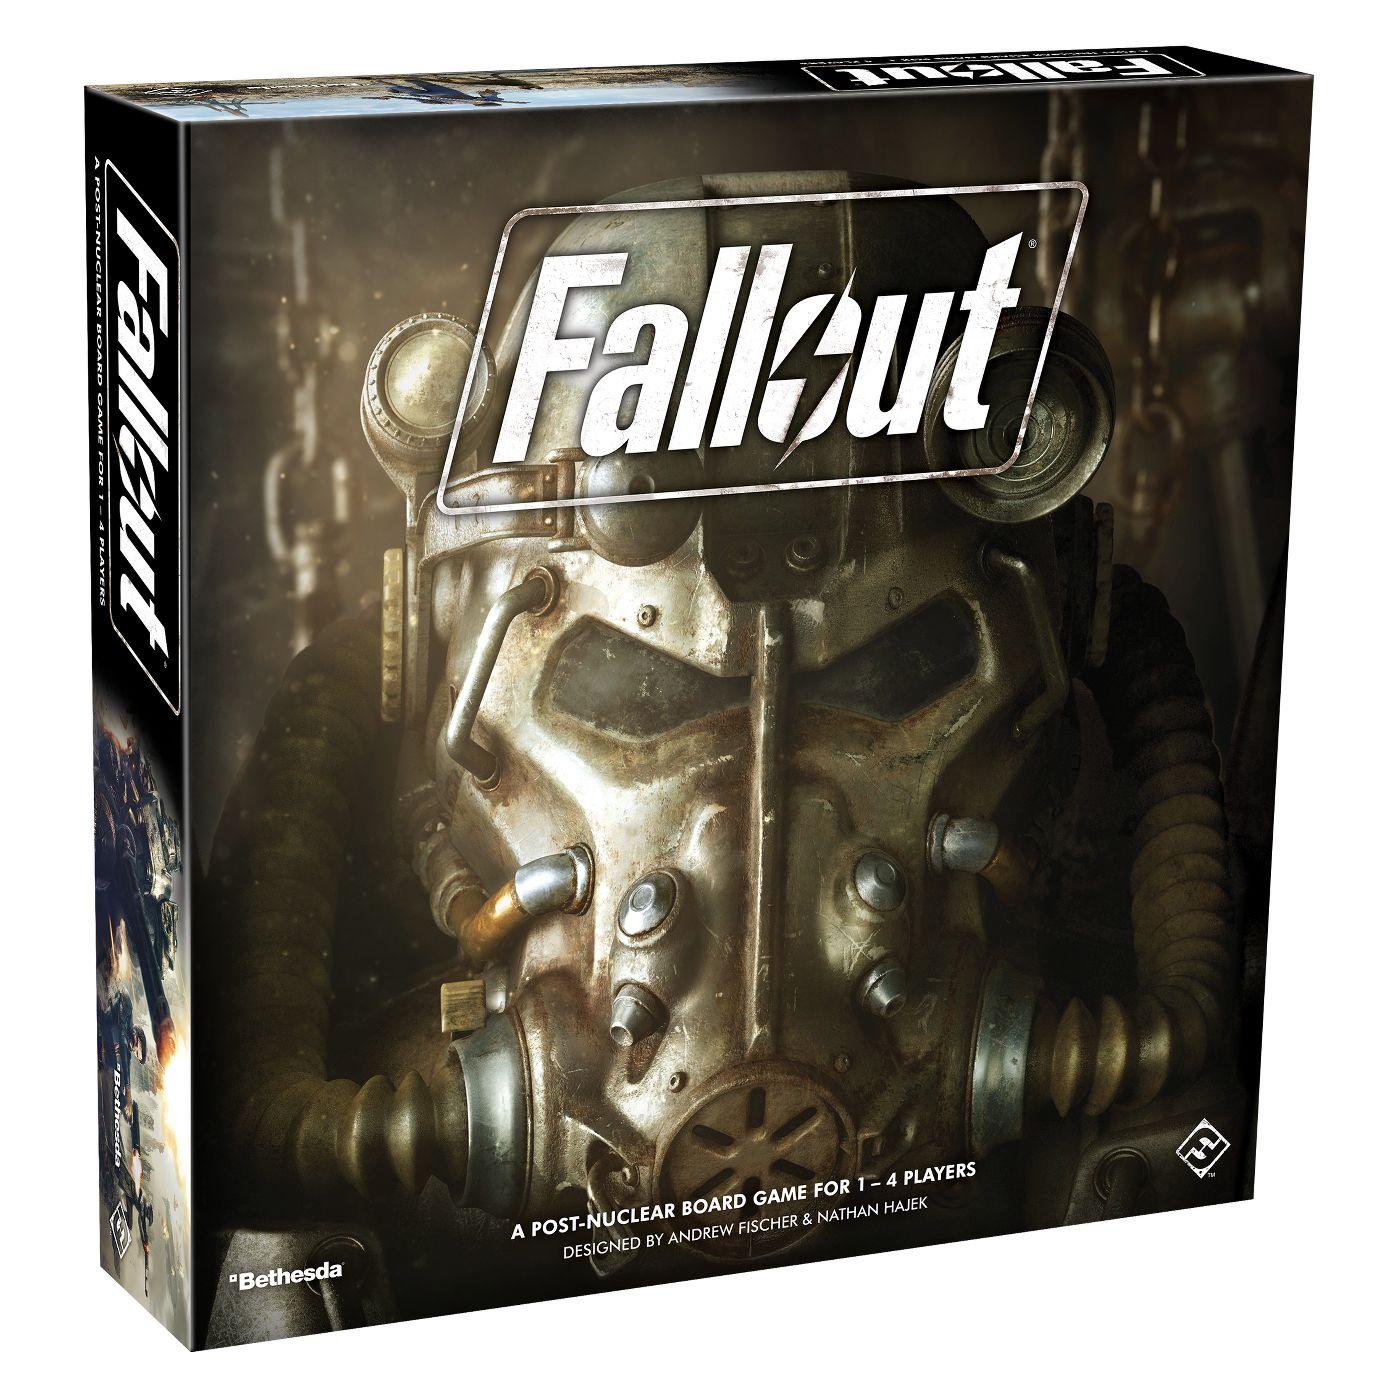 Fallout Board Game - $17.98 (YMMV) at Target, New California Expansion - $14.97 at GameStop